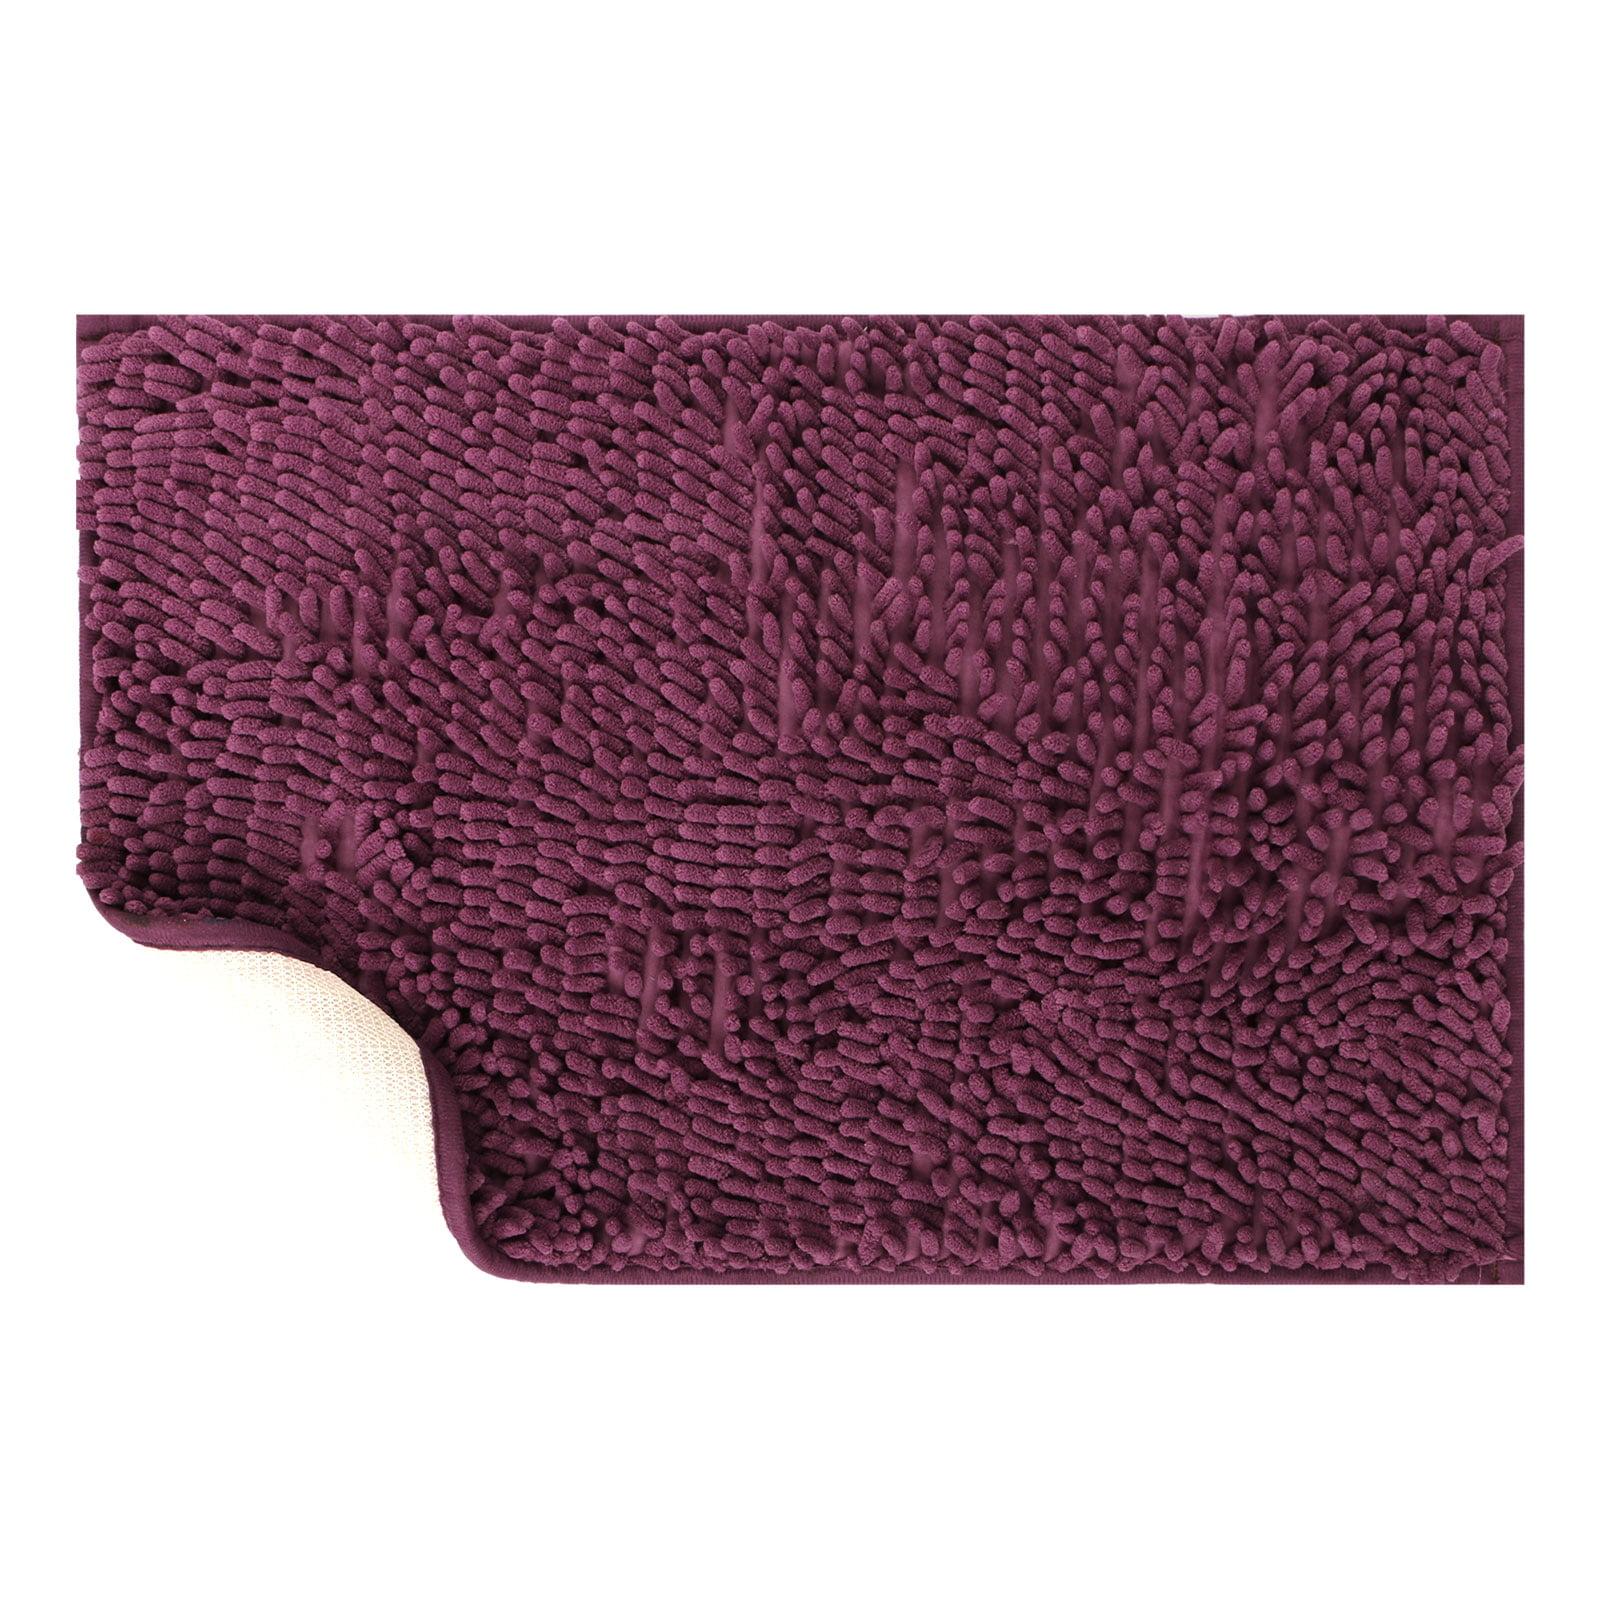 Non-Slip Soft Bathroom Rug Shag Shower Mat Machine-Washable Absorbent Bath Mats